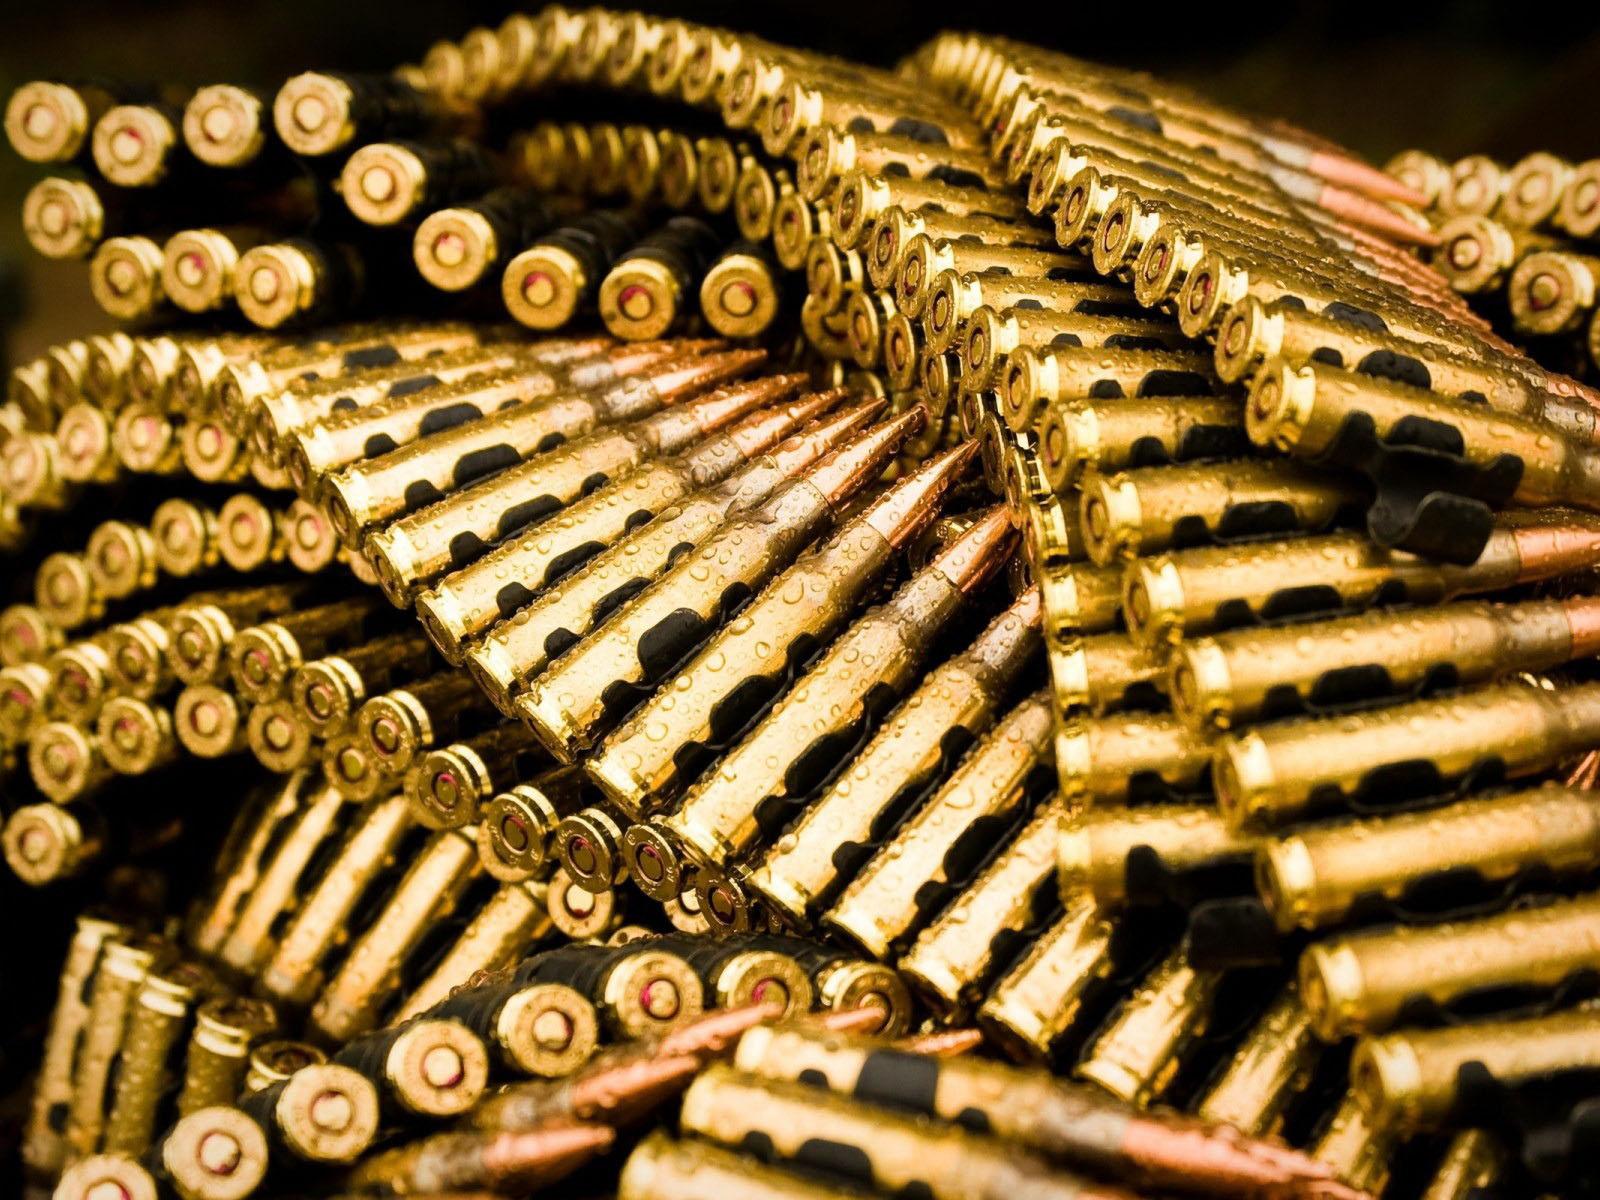 Pistols and bullets | $Pheonix m6$